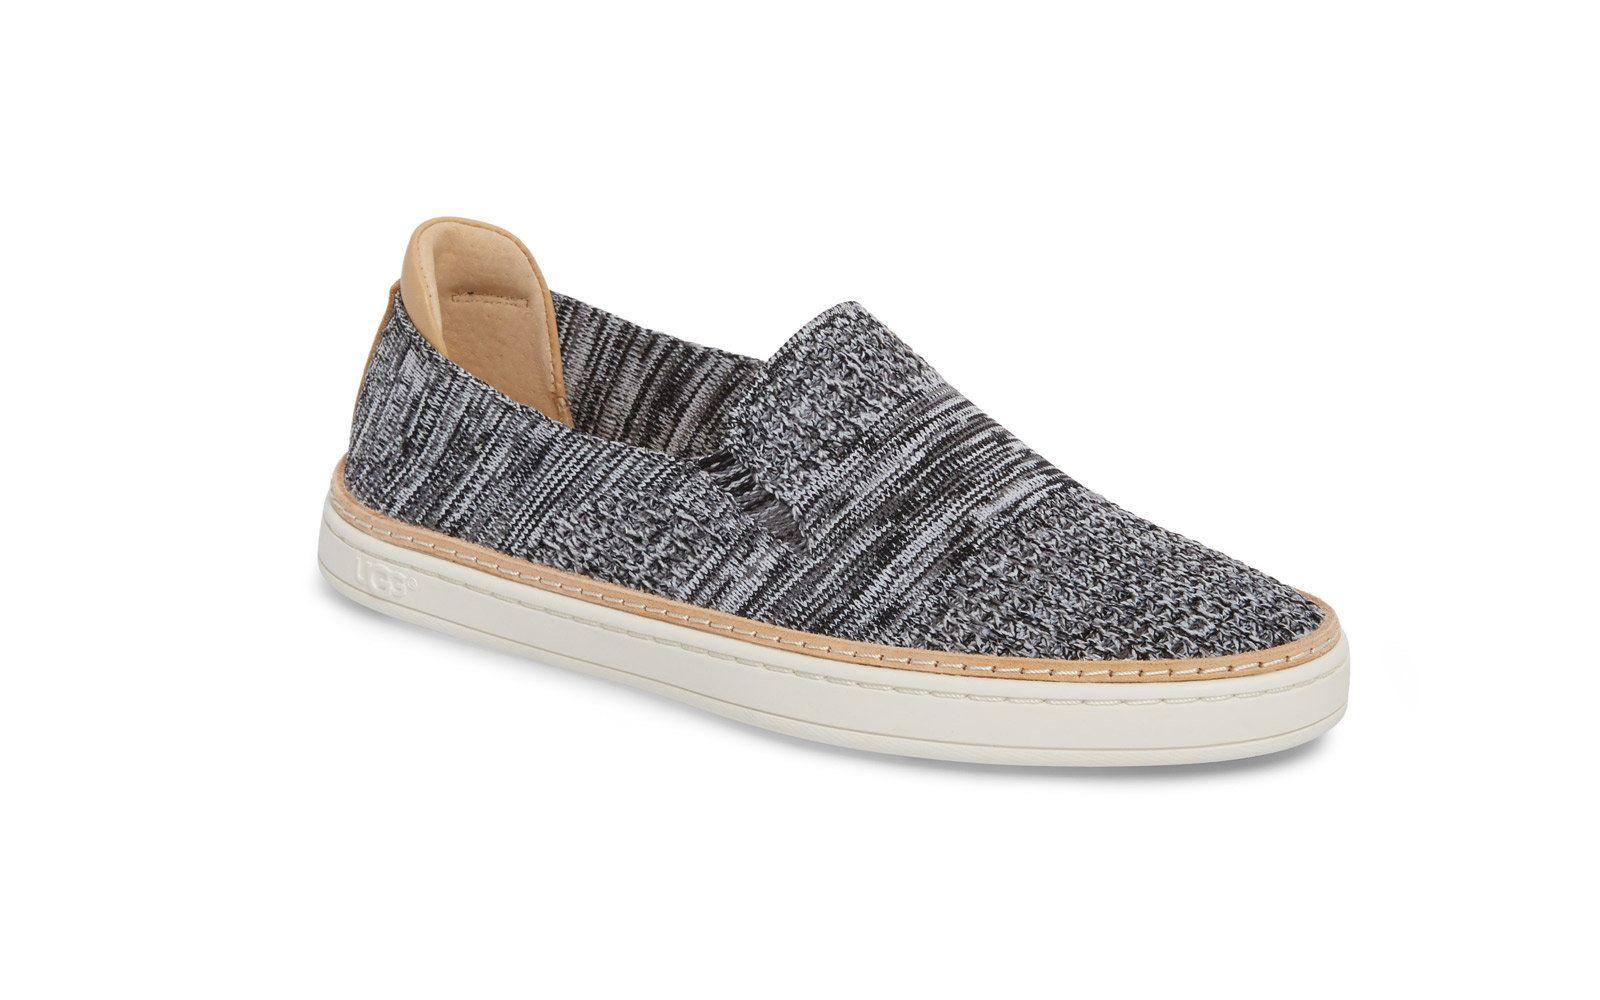 21f0d9fc54c82 Best for  Cool Knit Flats